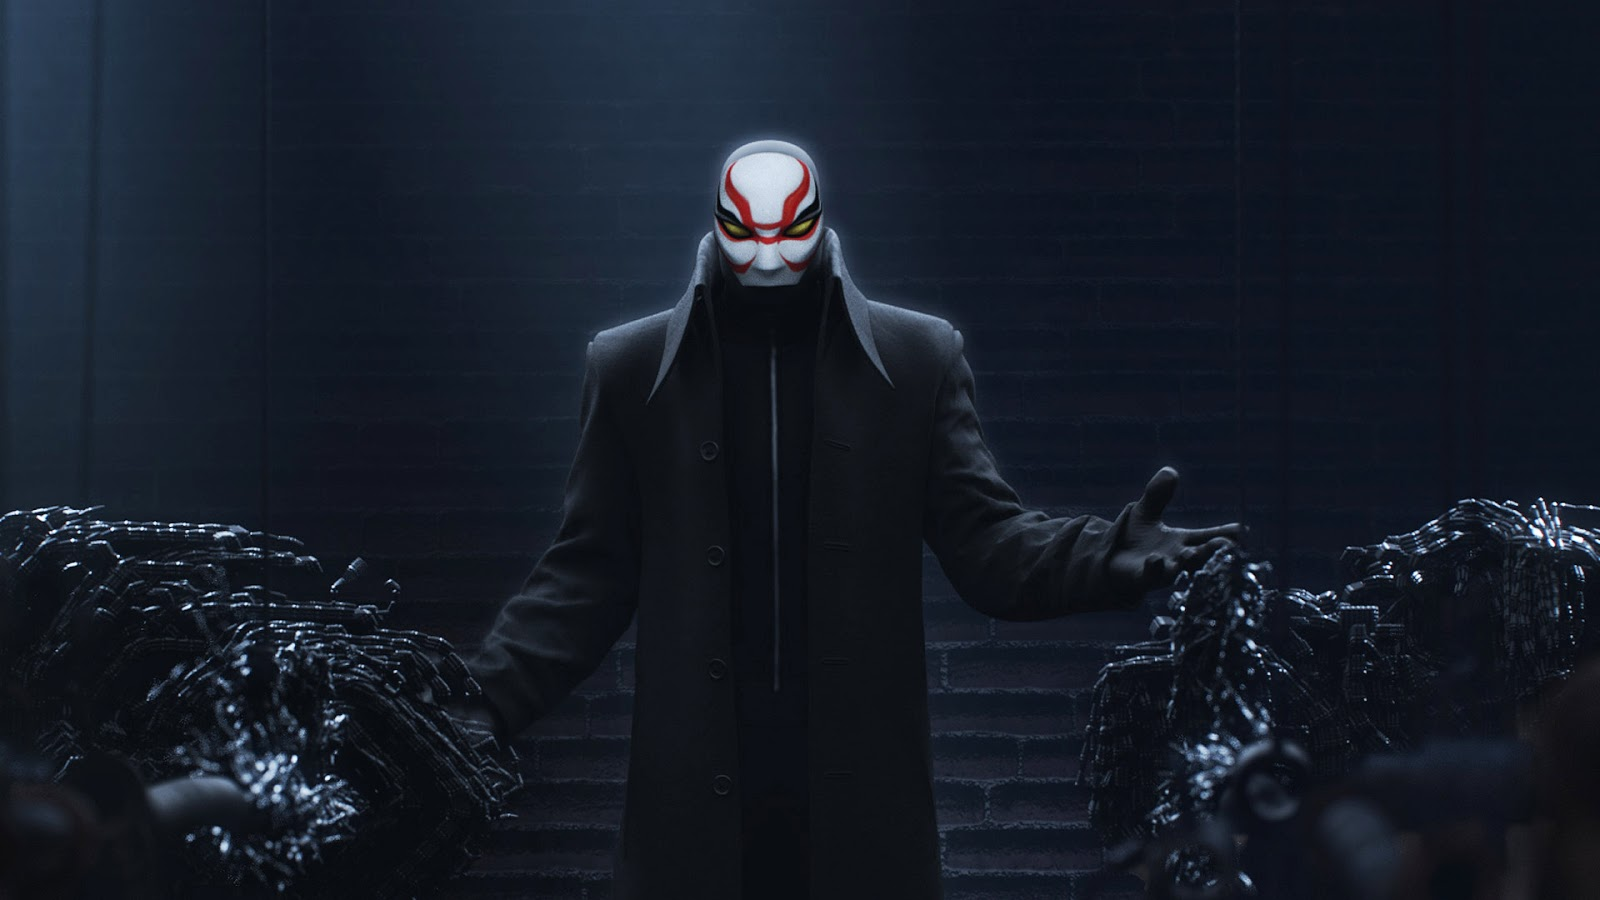 Velká šestka (Big Hero 6) – Recenze